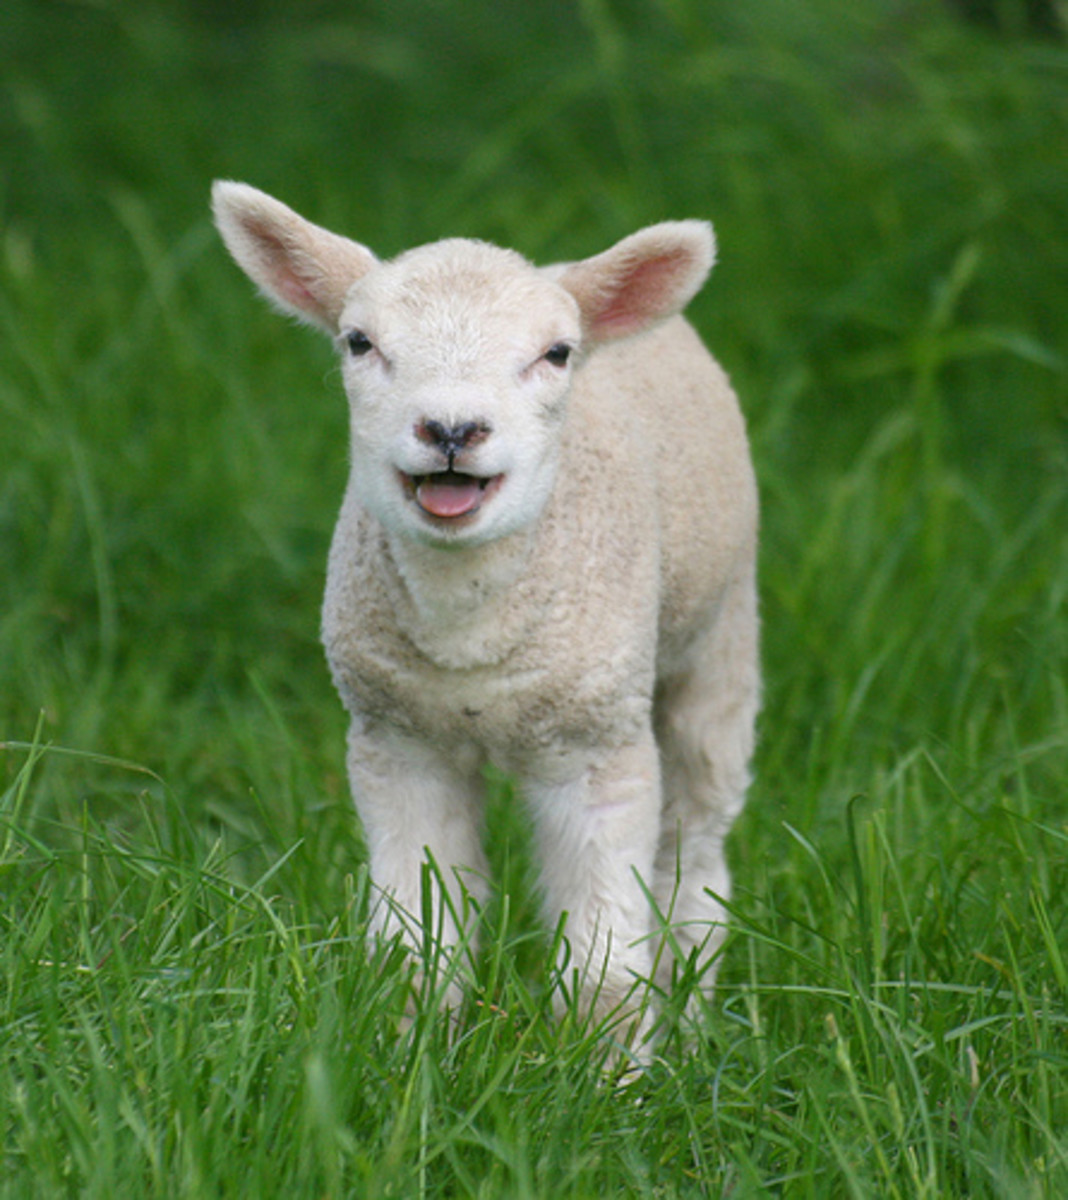 Mukti the Lamb Comes of Age: A Short Story